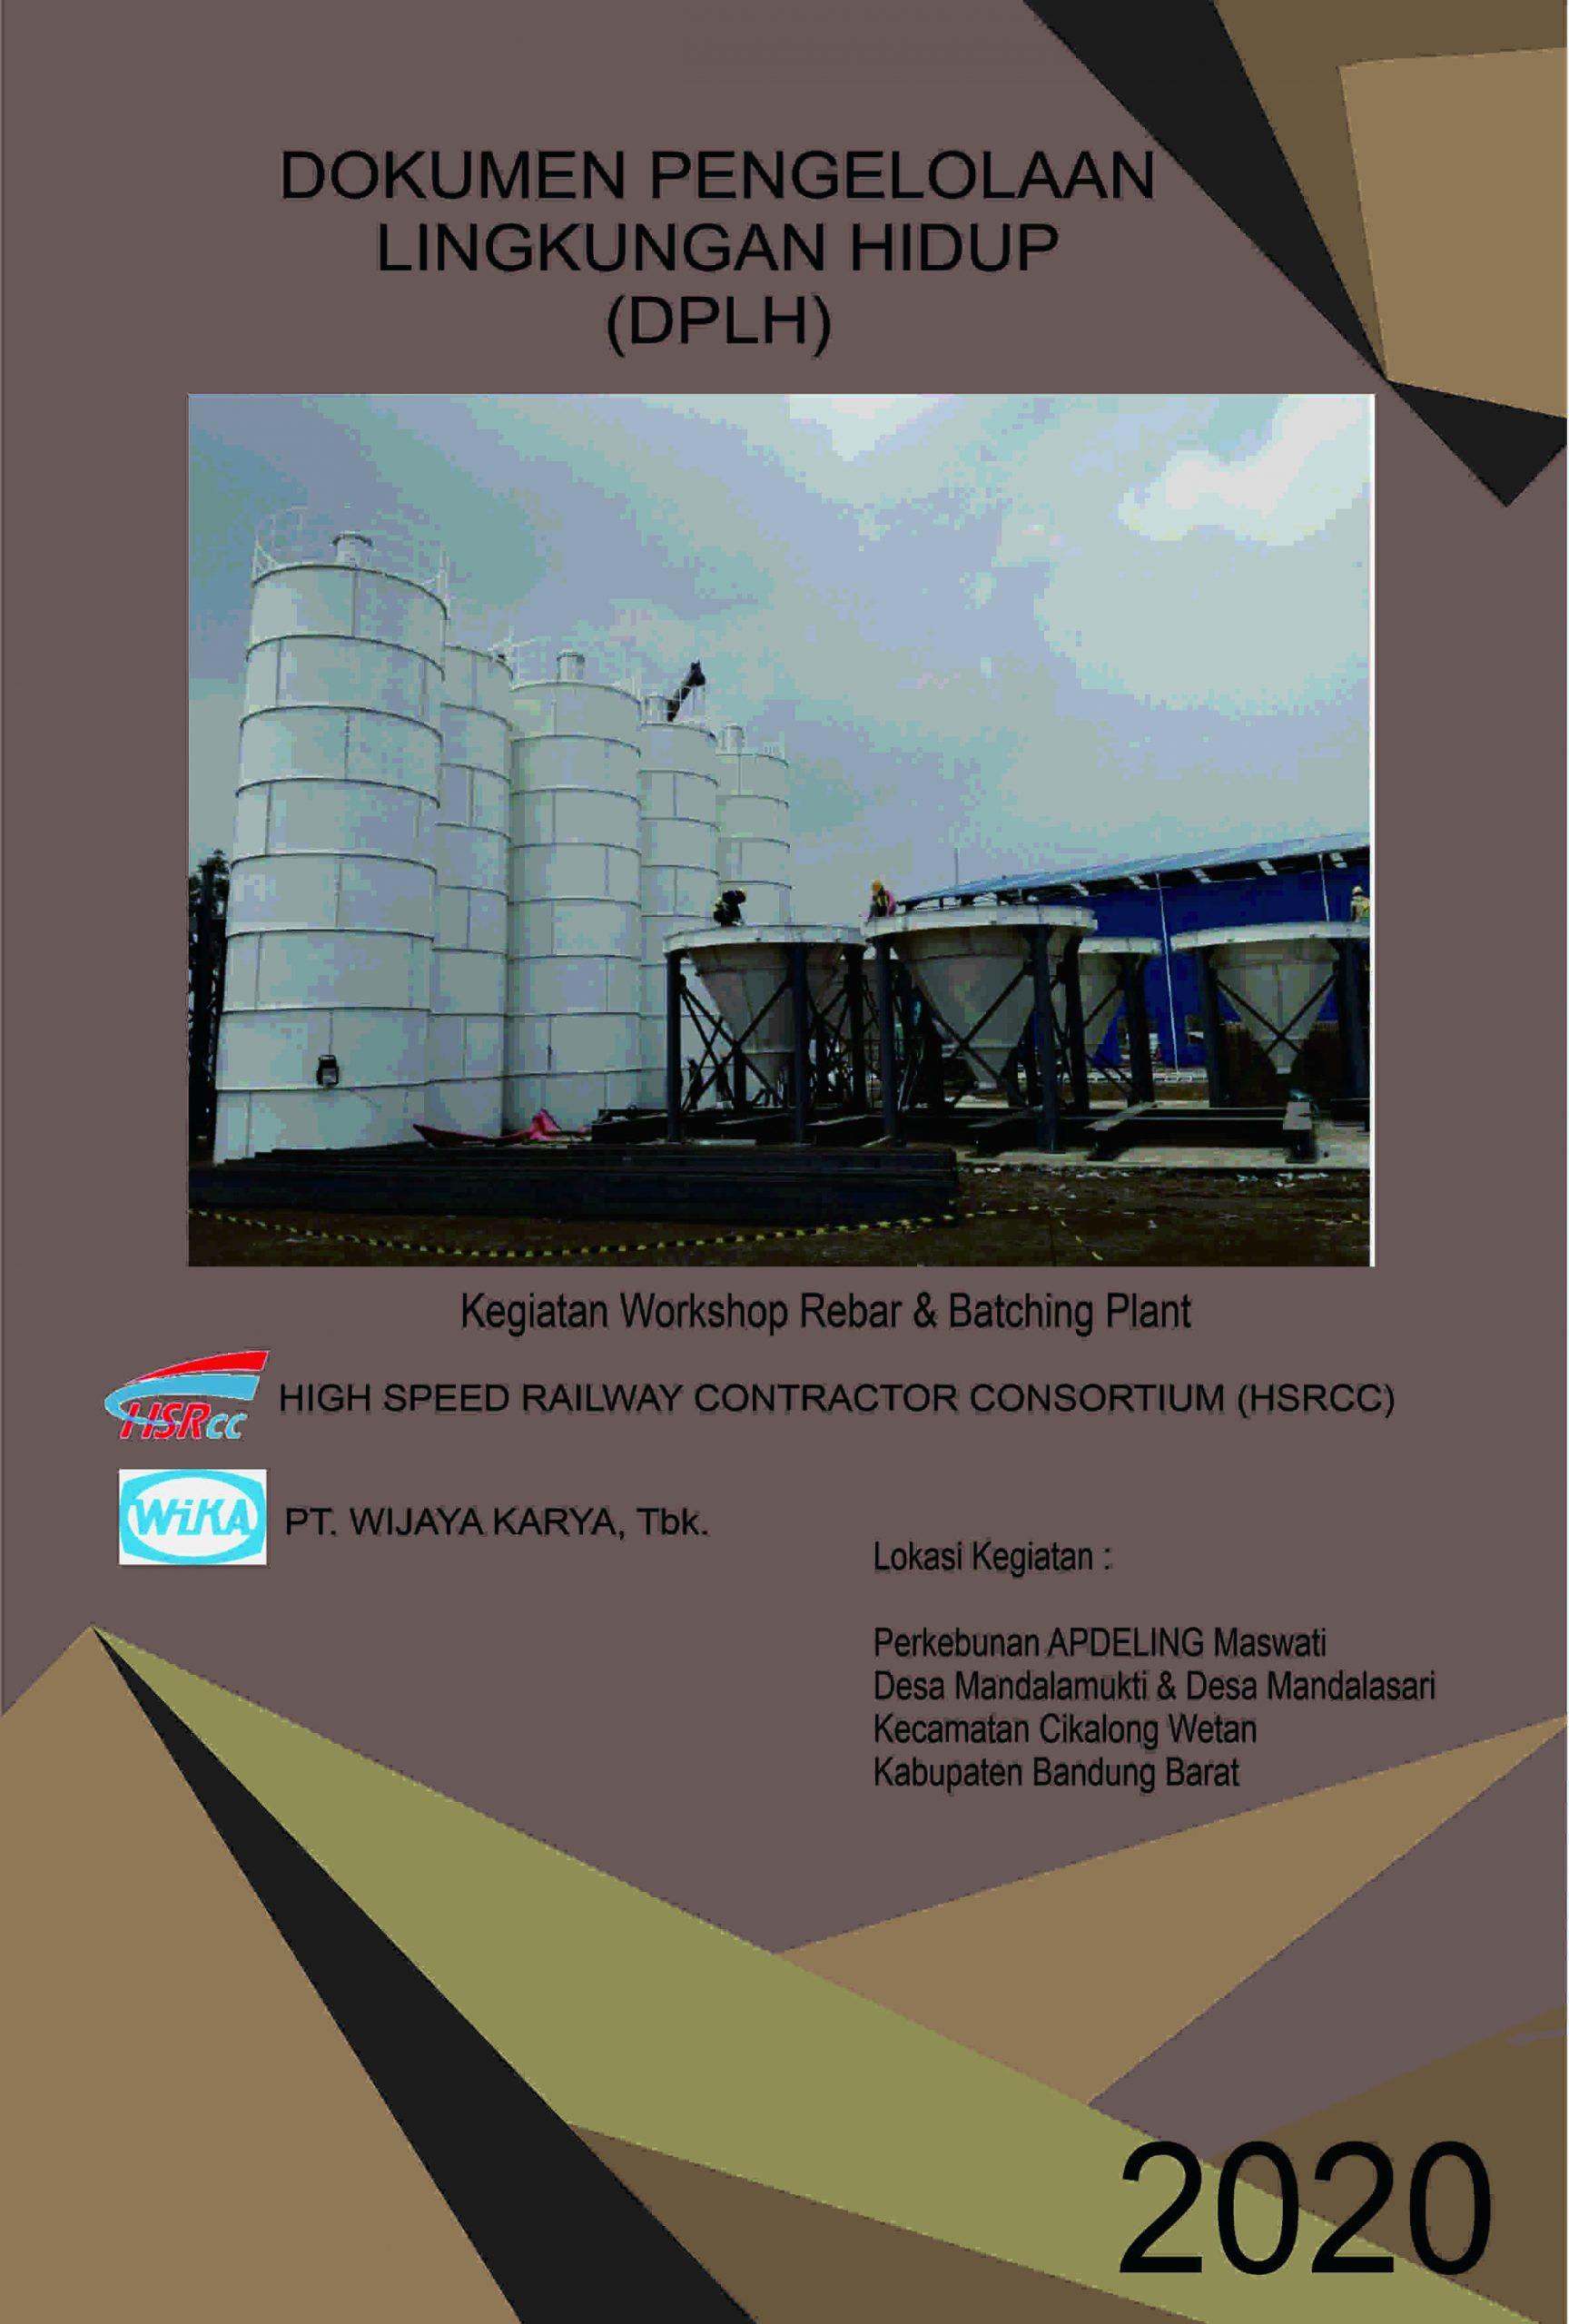 DPLH Kegiatan Workshop Rebar & Batching Plant dari High Speed Railway Contractor Consortium (HSRCC) PT. Wijaya Karya, Tbk